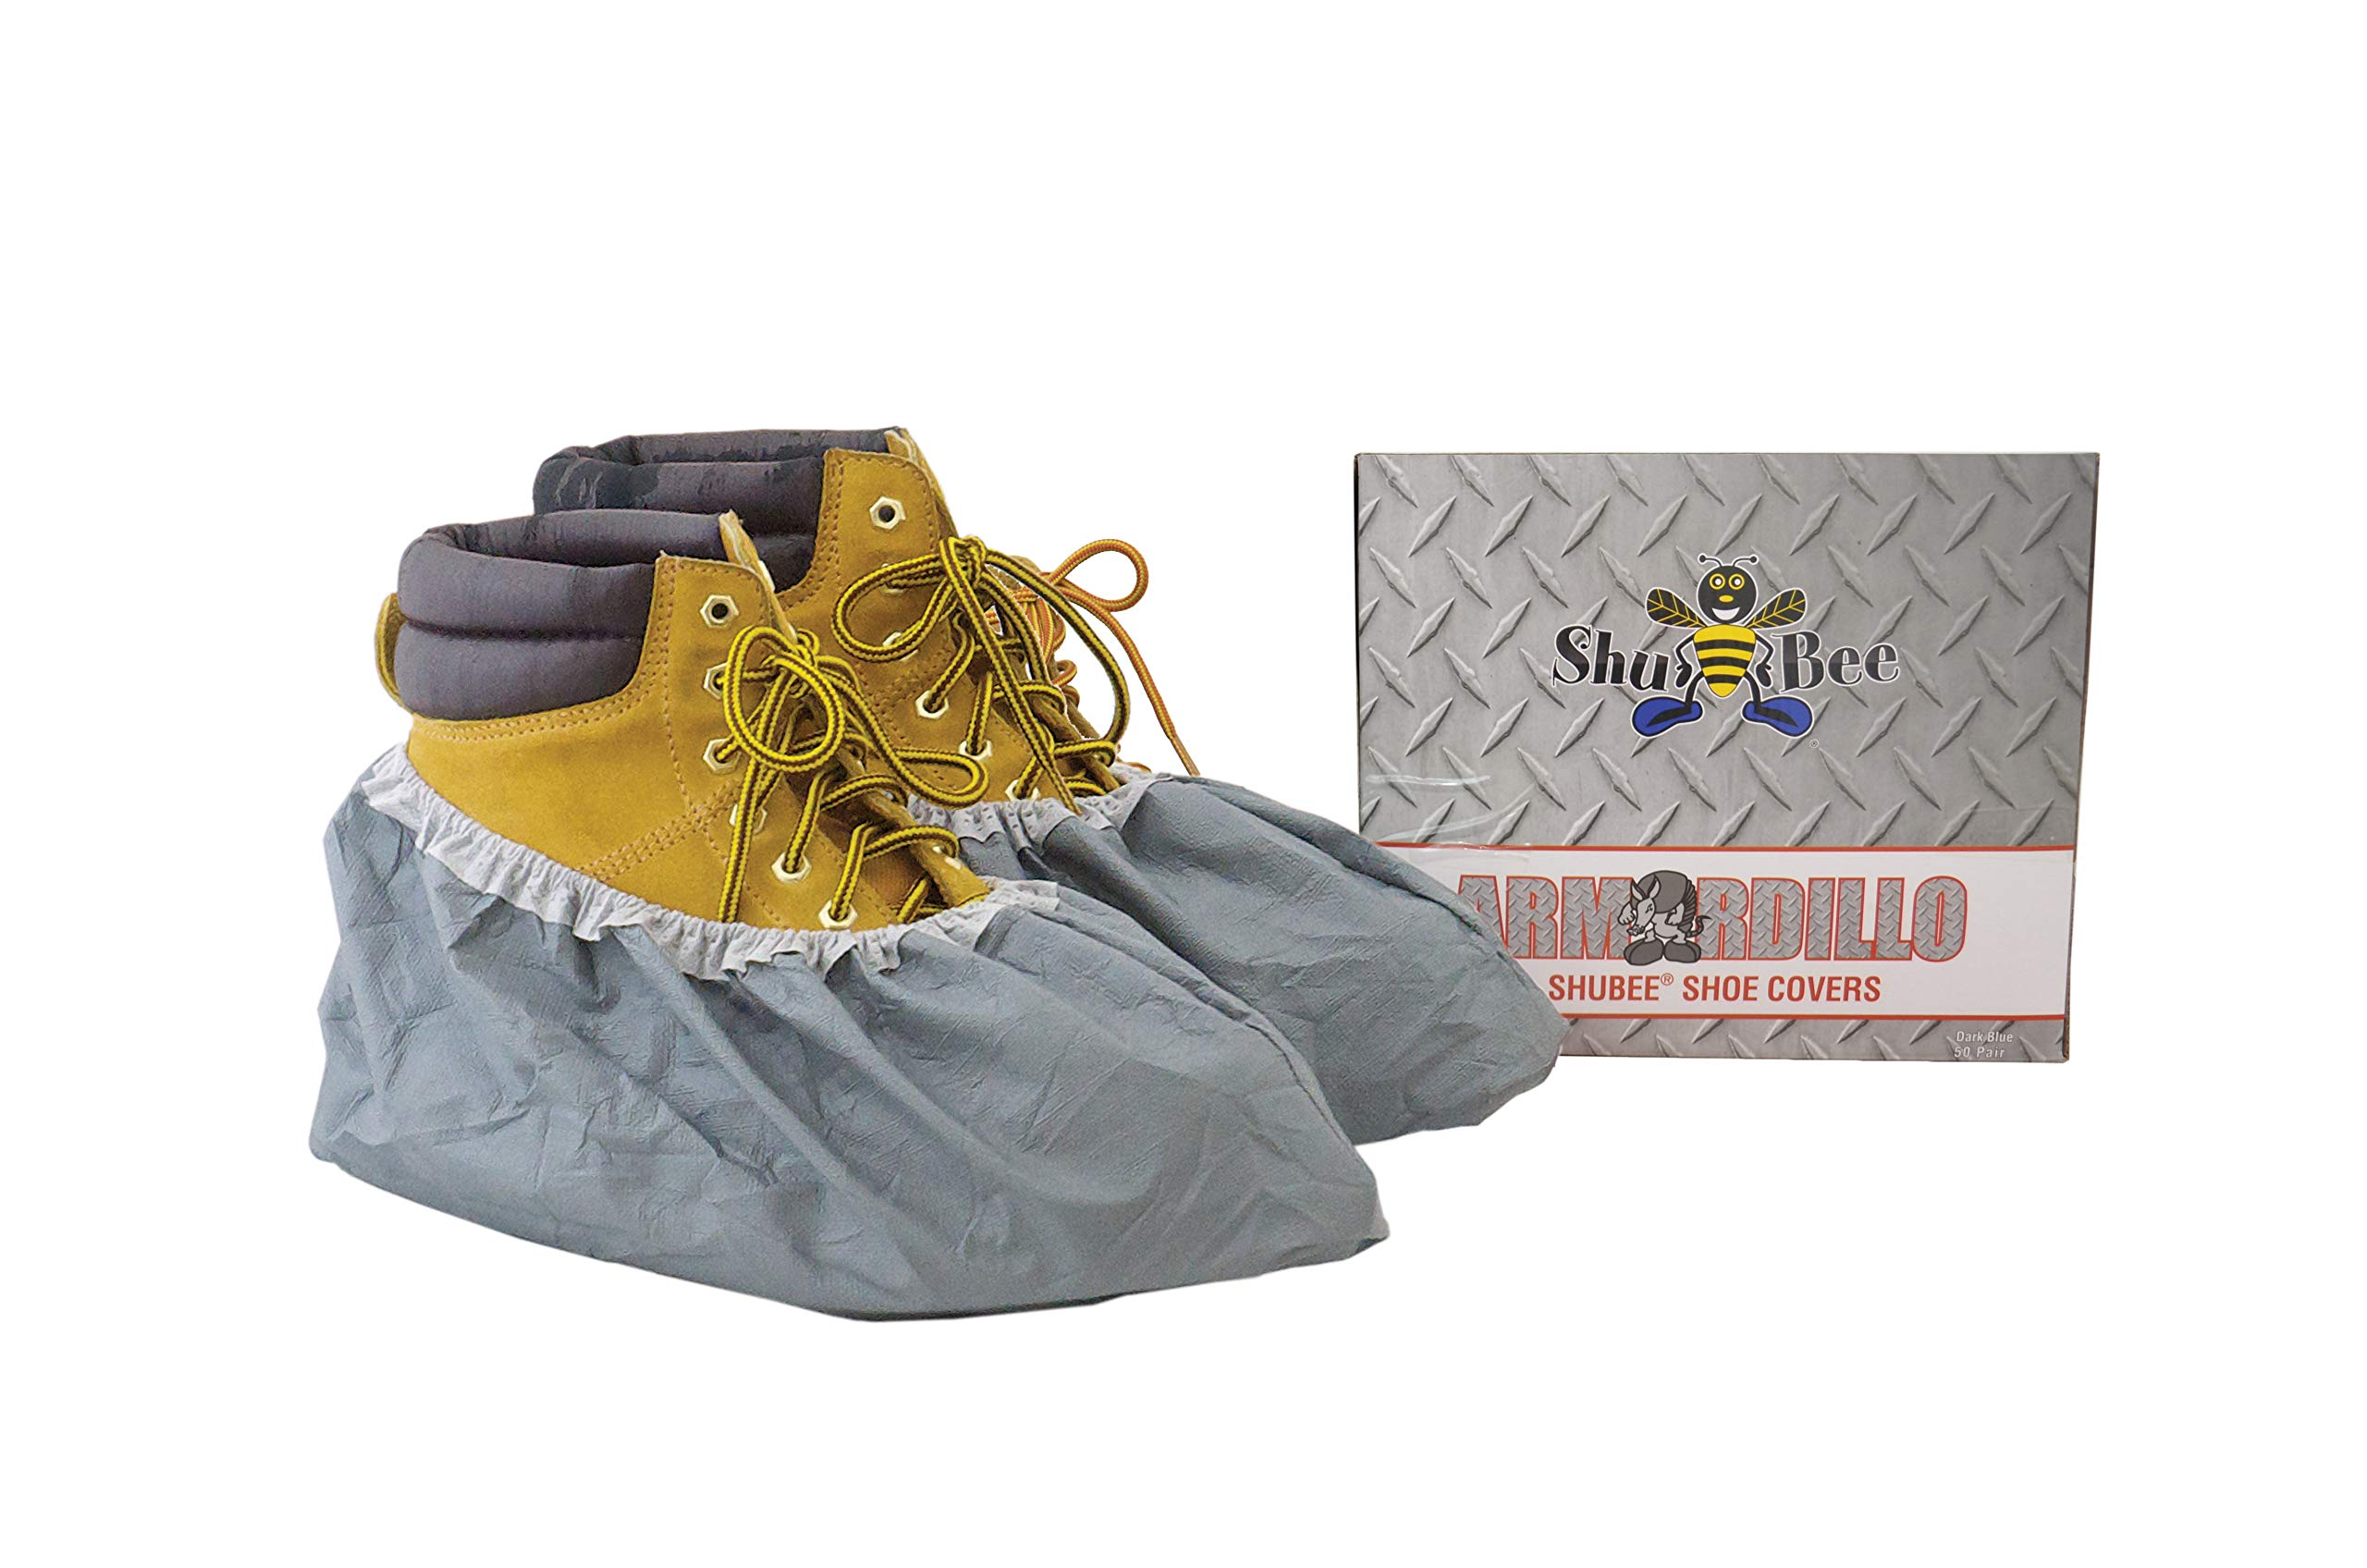 Shubee C SB SC ARM Shoe Covers, Grey, (50 Pair) by ShuBee